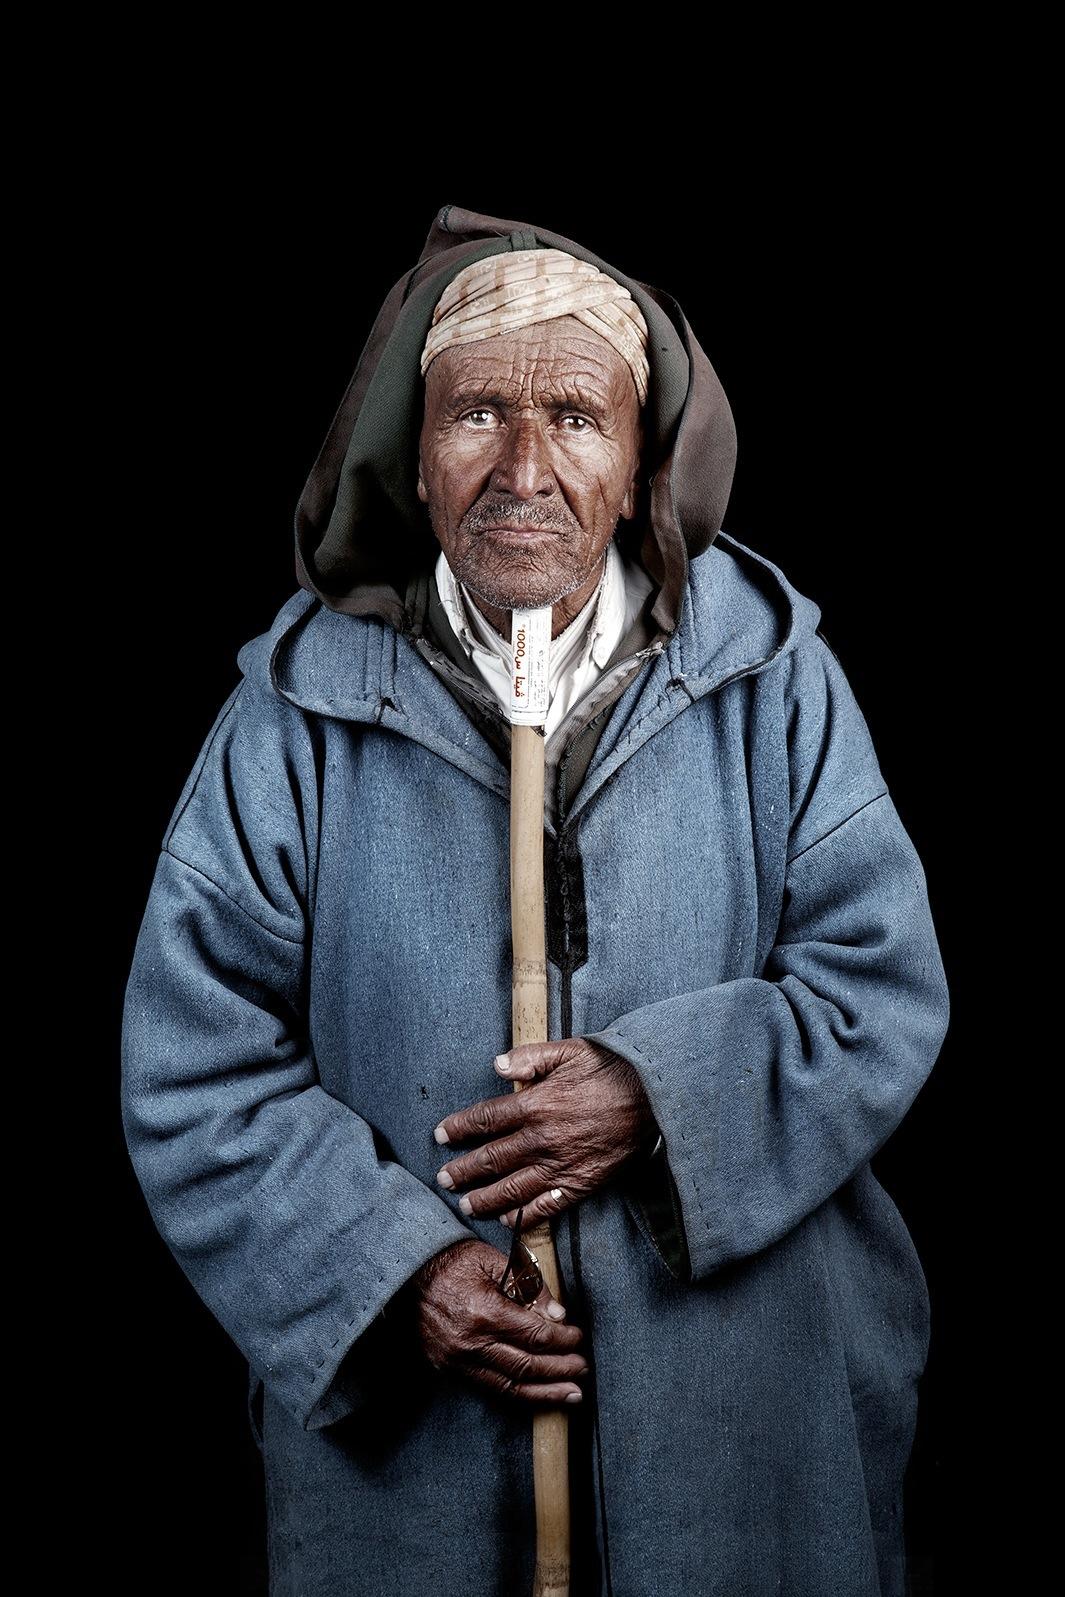 Марокканцы - портреты от Лейлы Алауи-04